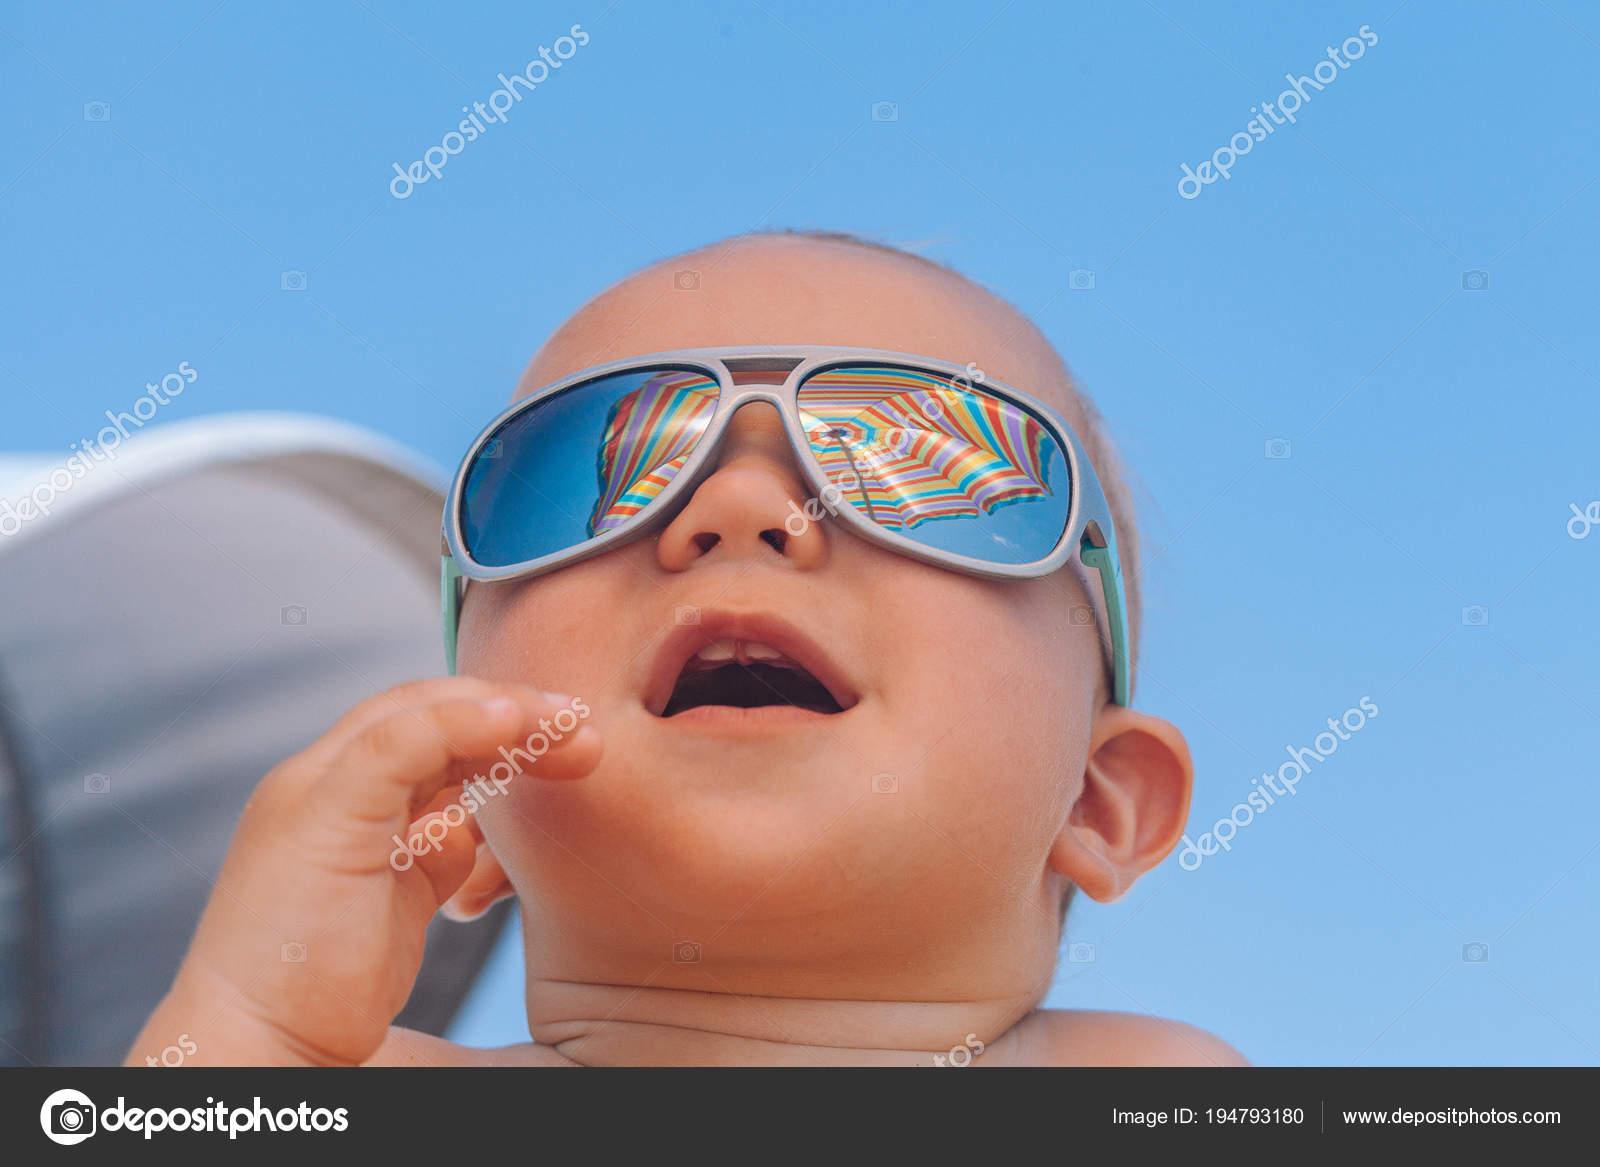 434e7973a9 Αξιολάτρευτο ευτυχισμένη αστεία χαμογελώντας χαριτωμένο μωρό αγόρι με γυαλιά  ηλίου στην παραλία — Εικόνα από ...